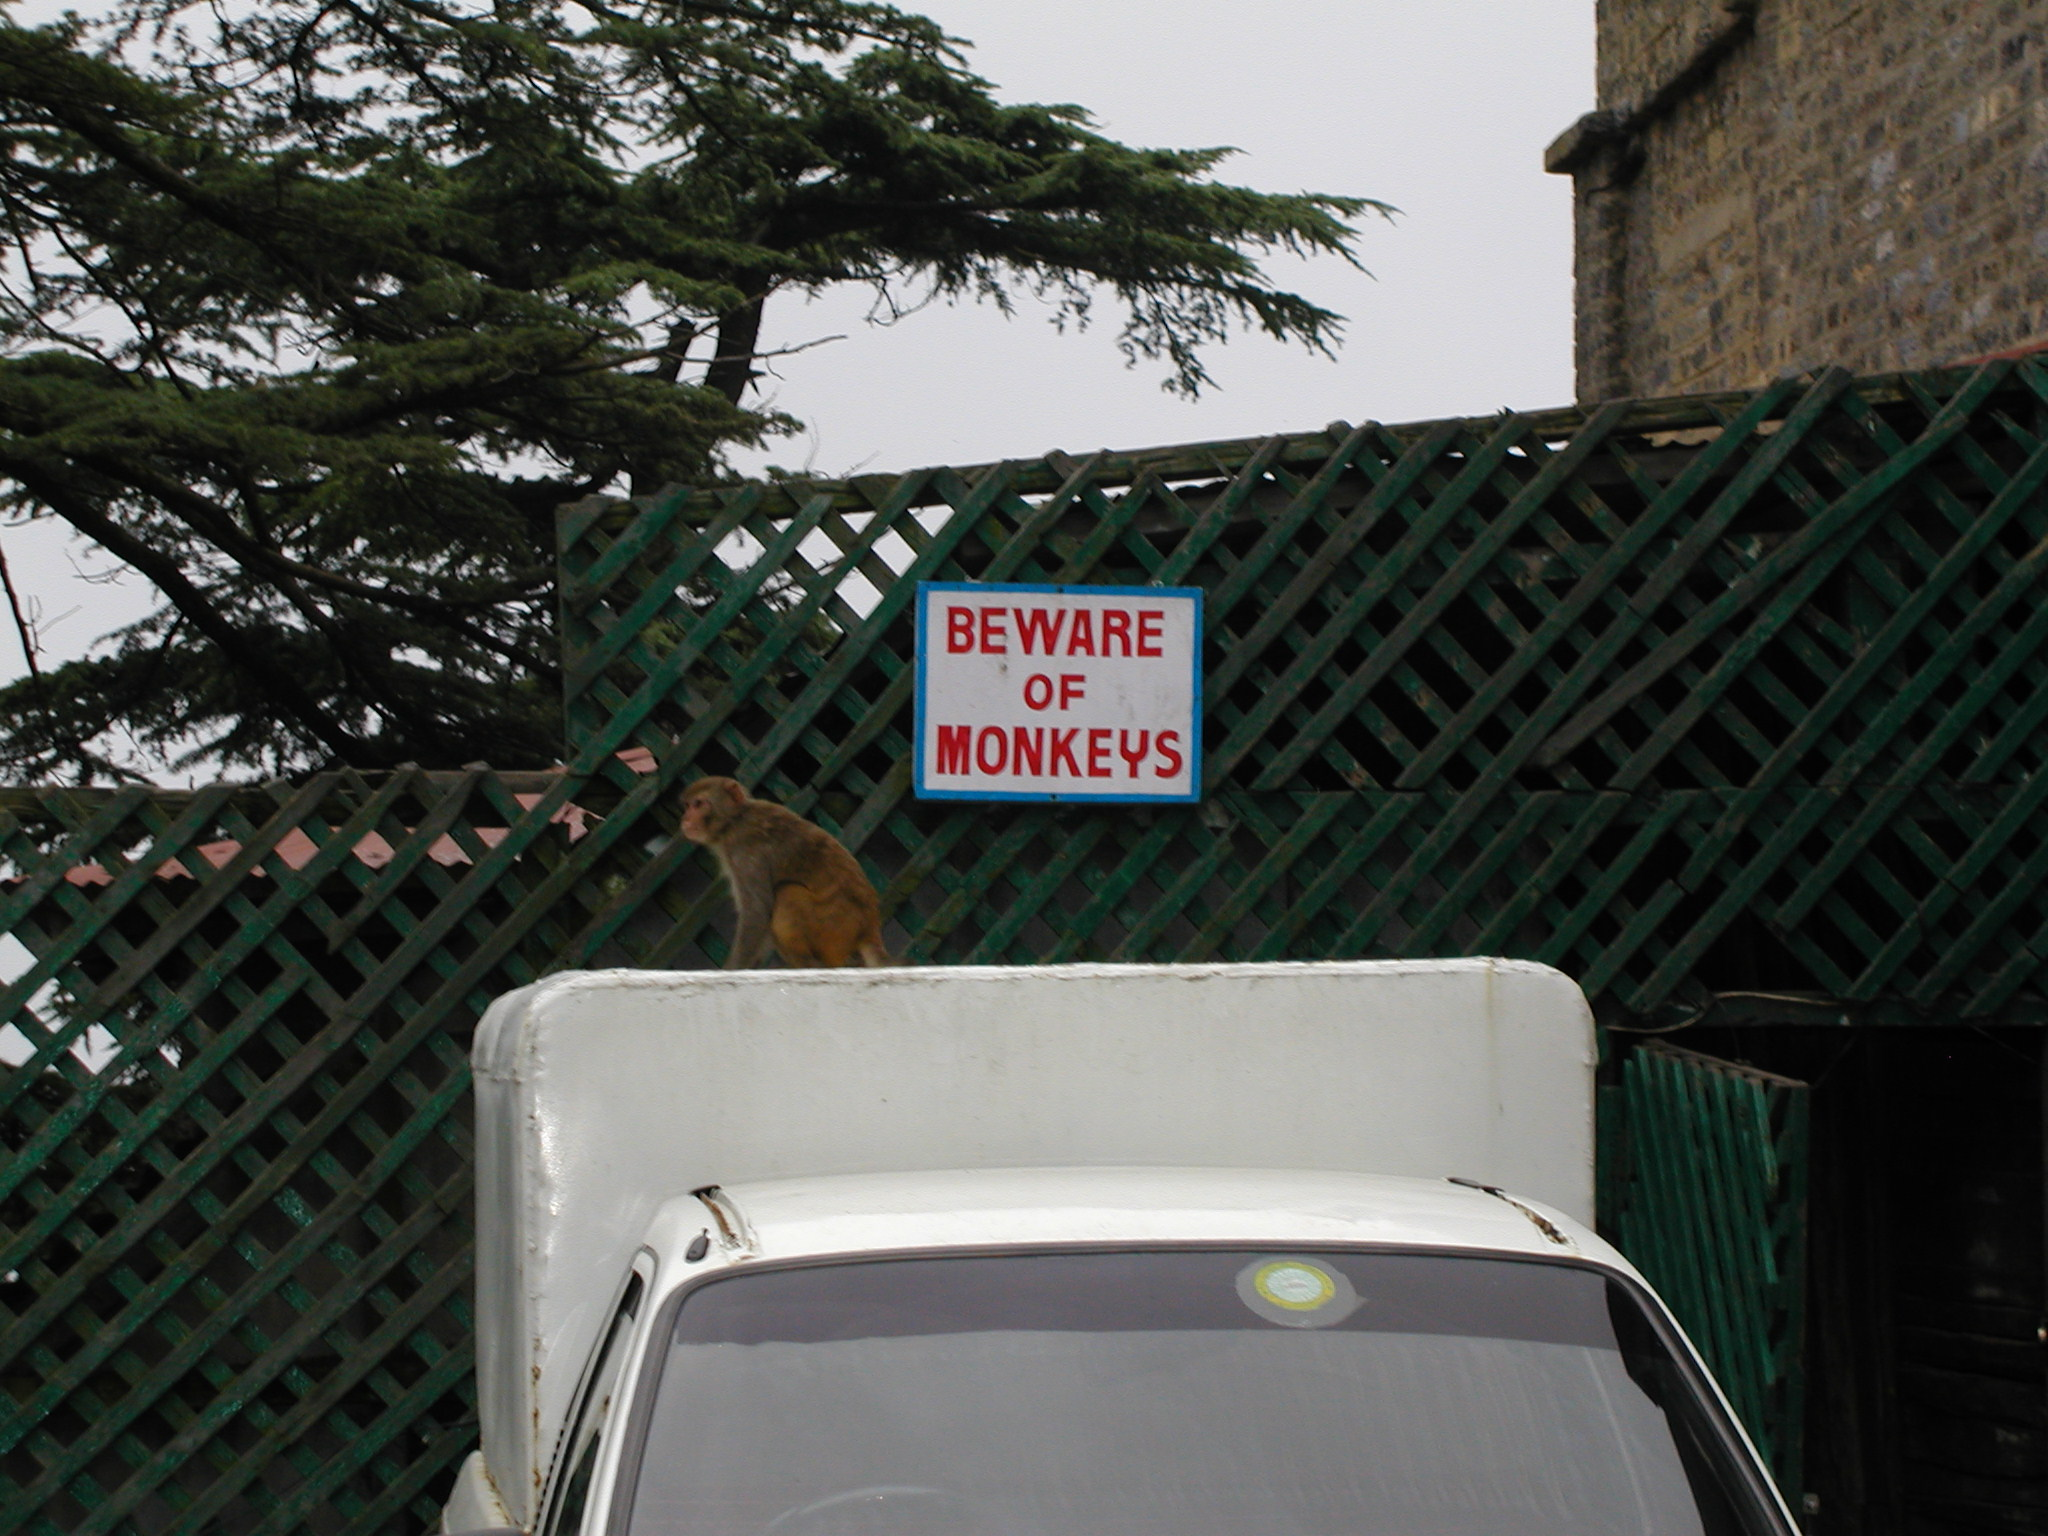 Beware of monkeys sign